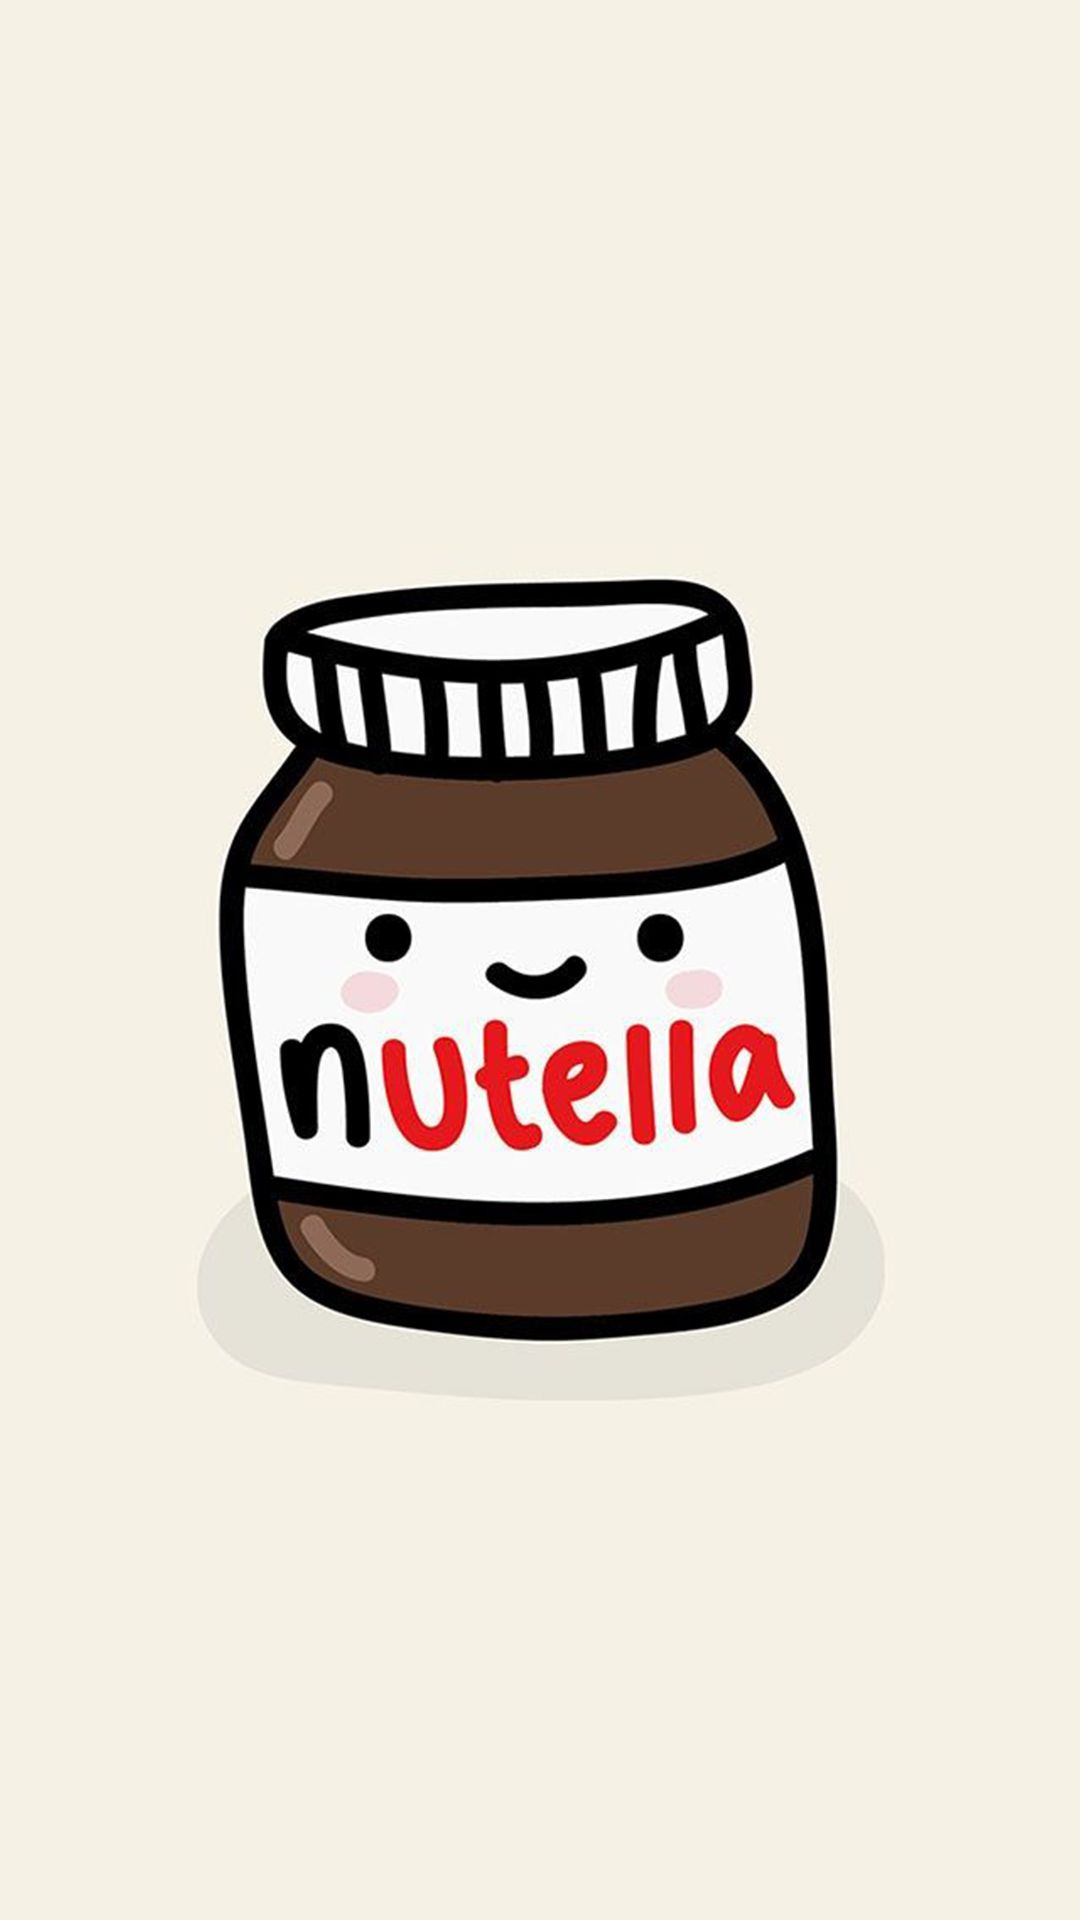 photo nutella hd wallpaper - photo #8